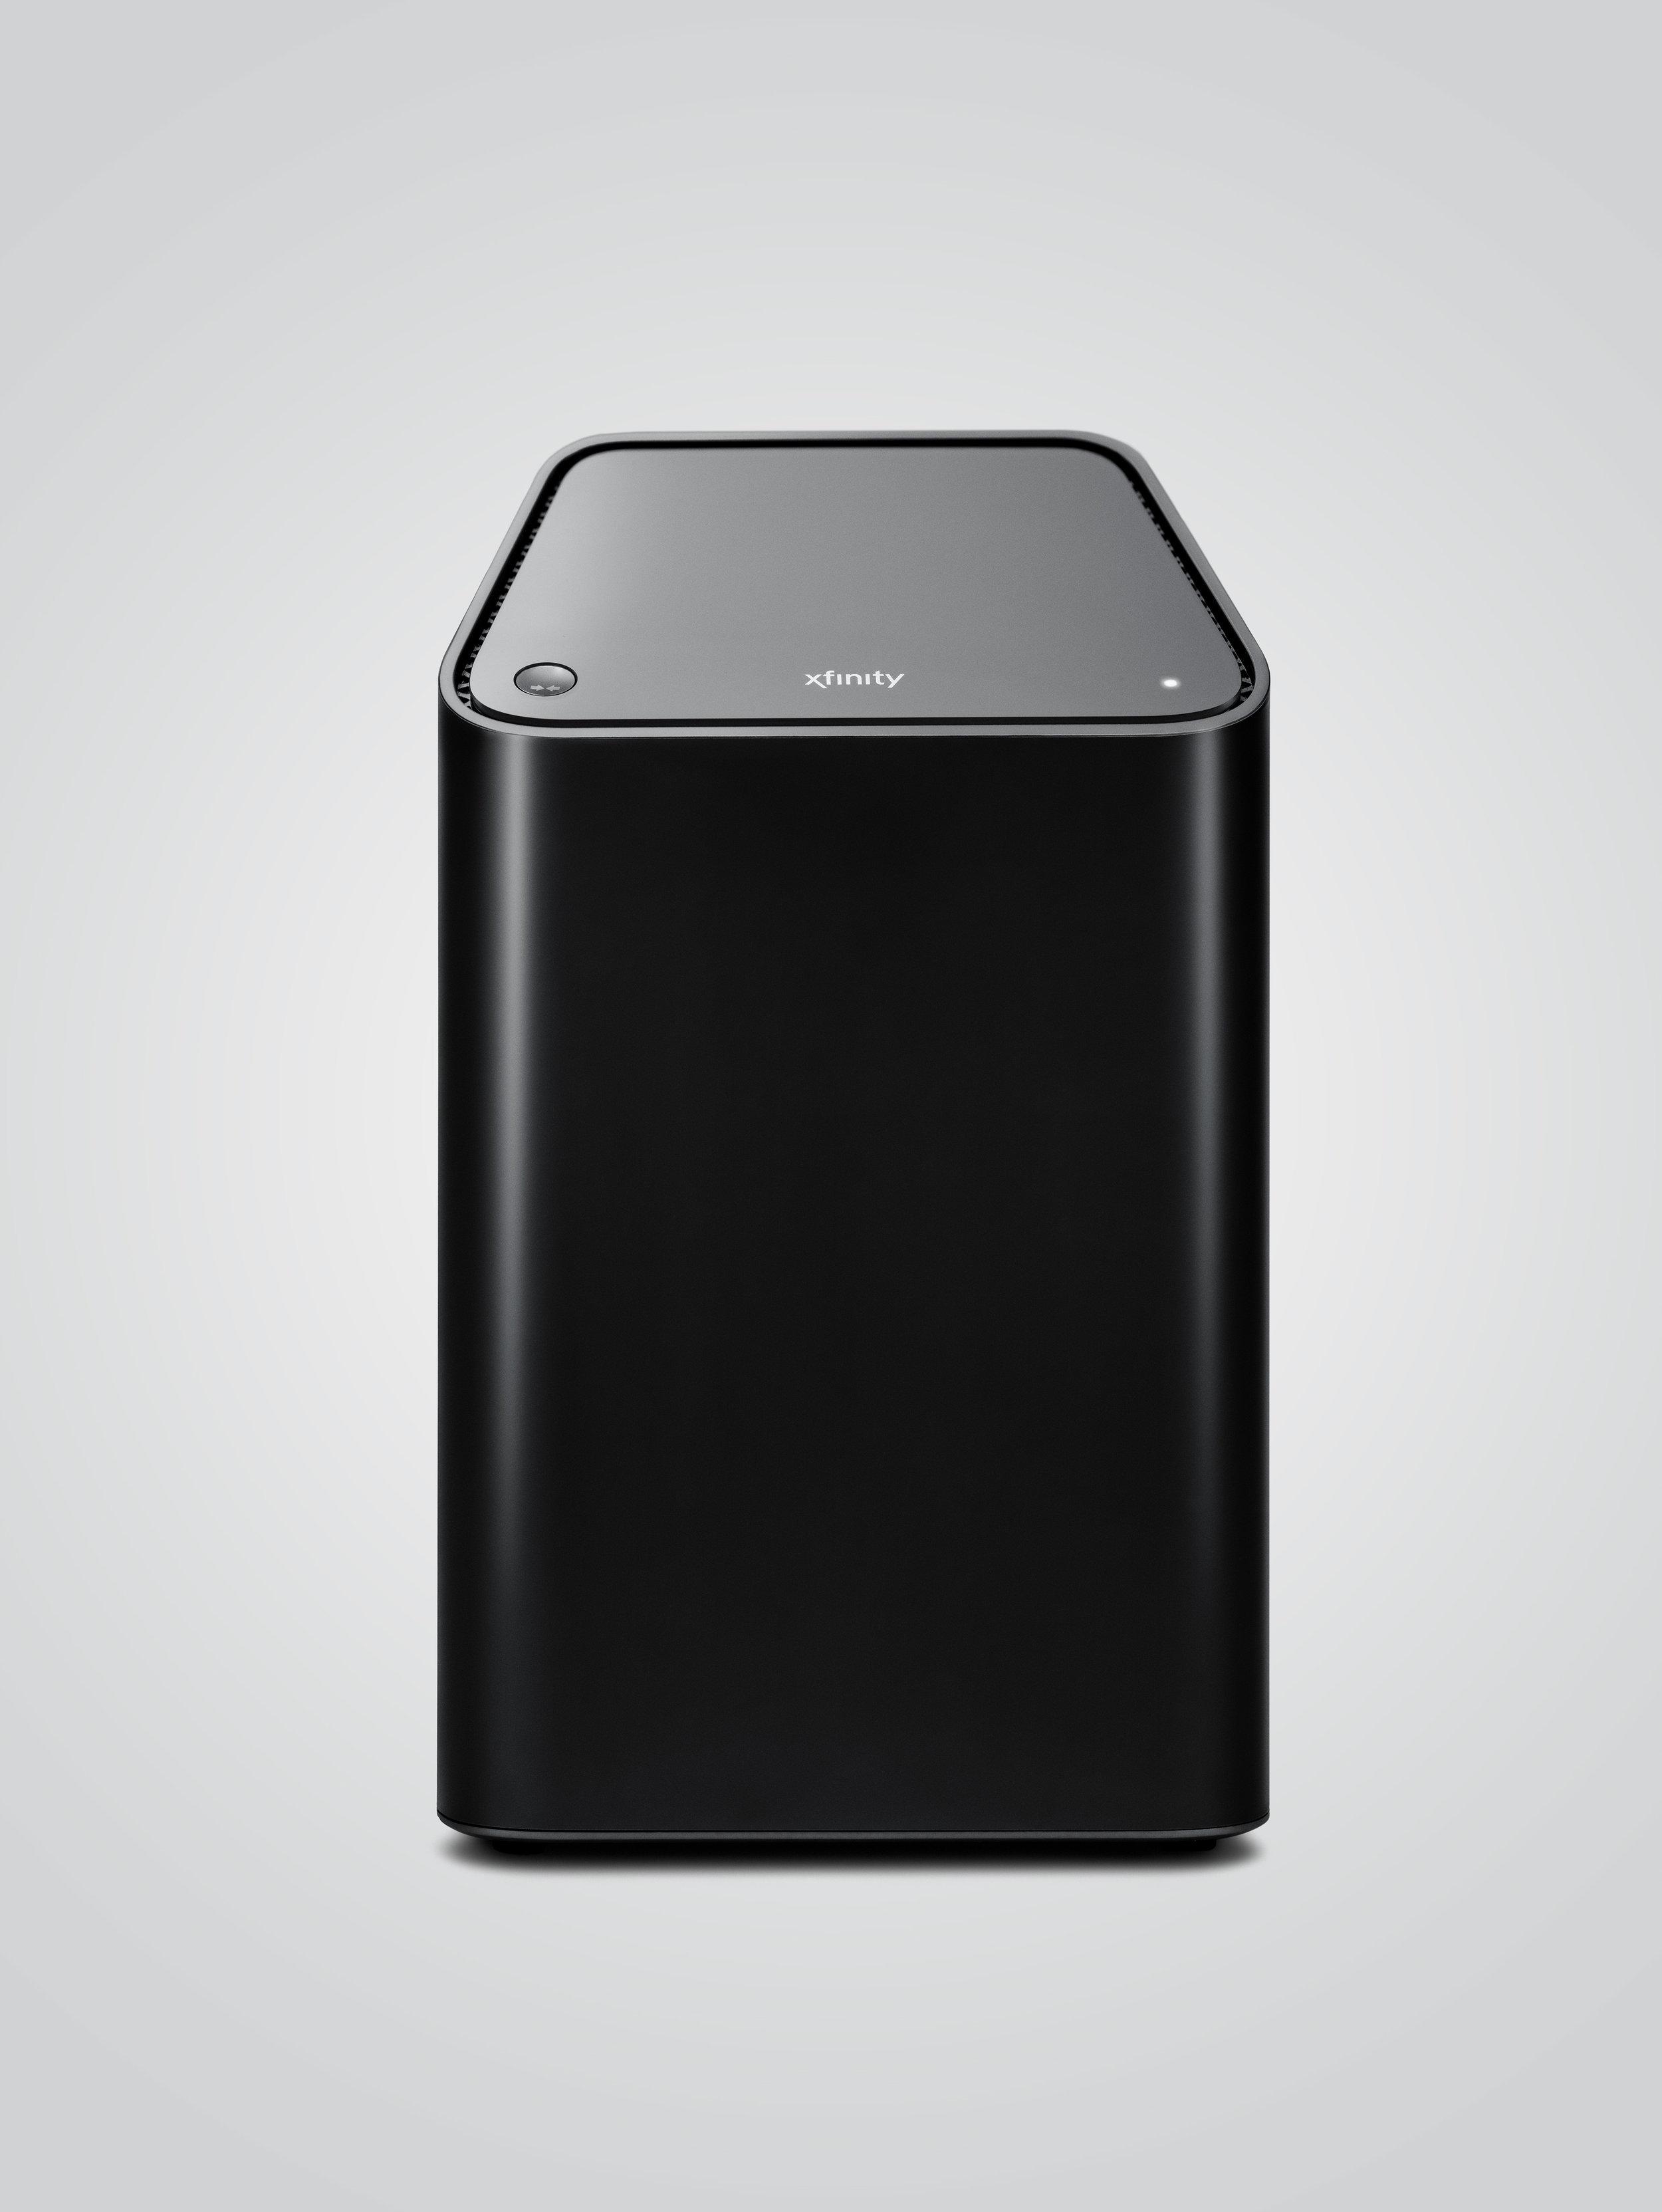 Xfinity Xp6 Router7271-R2-150dpi.jpg